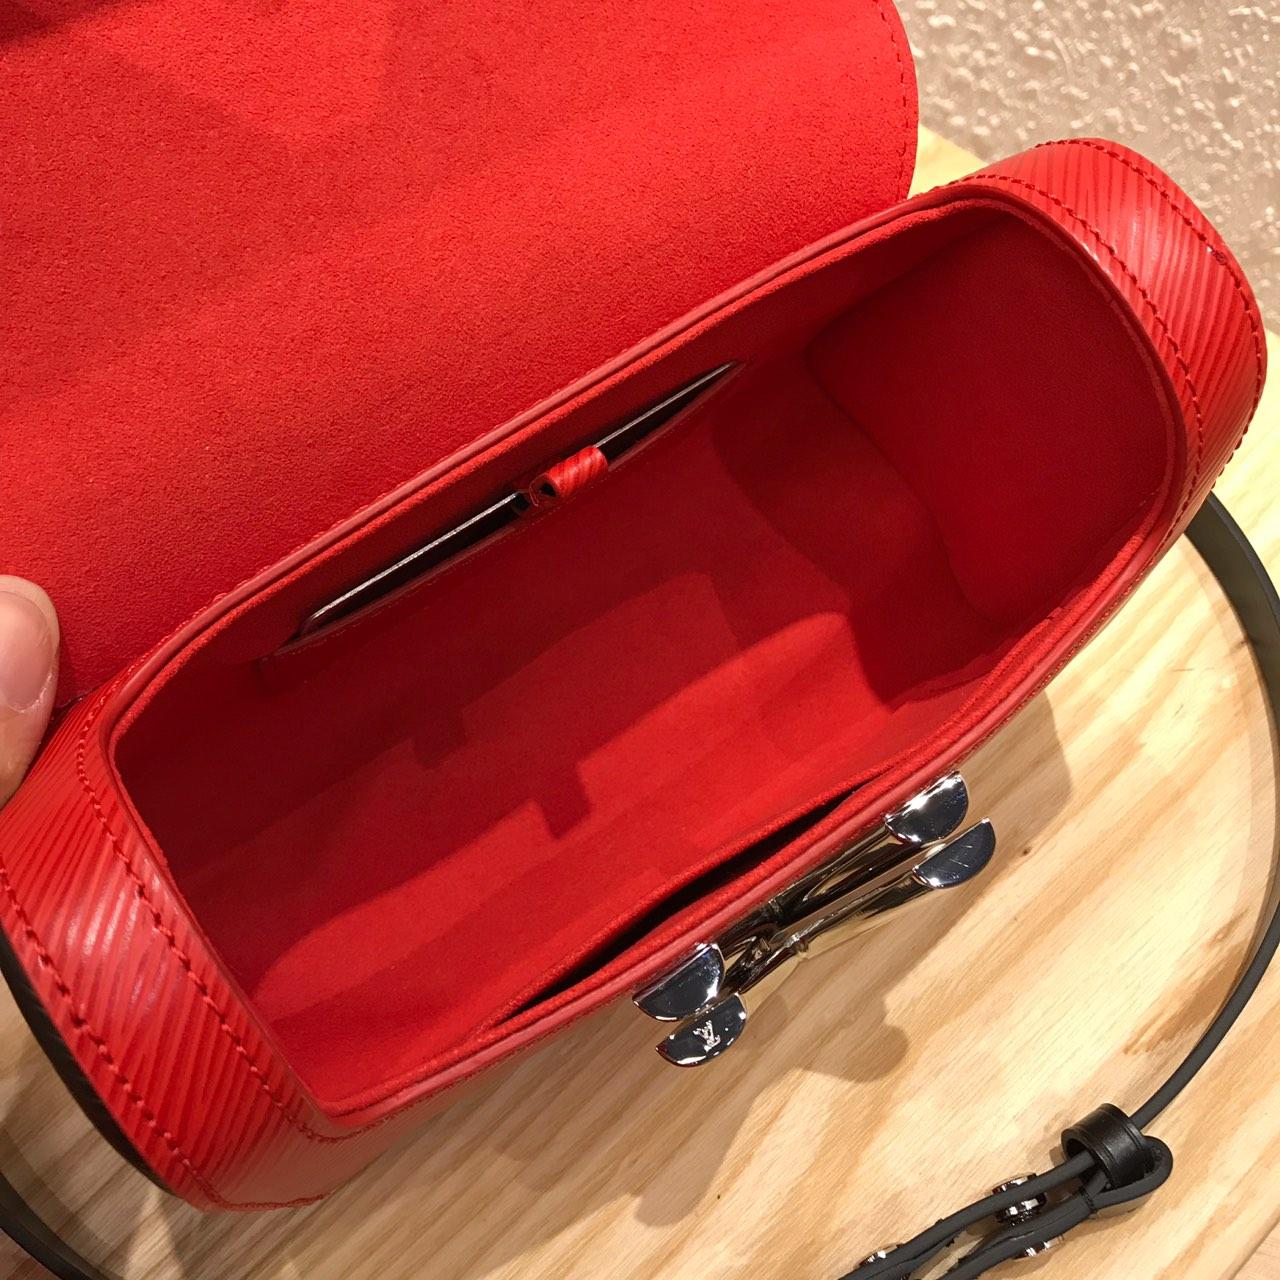 LV包包批发 Twist包新品小号50278 造型清贵低调简单大方